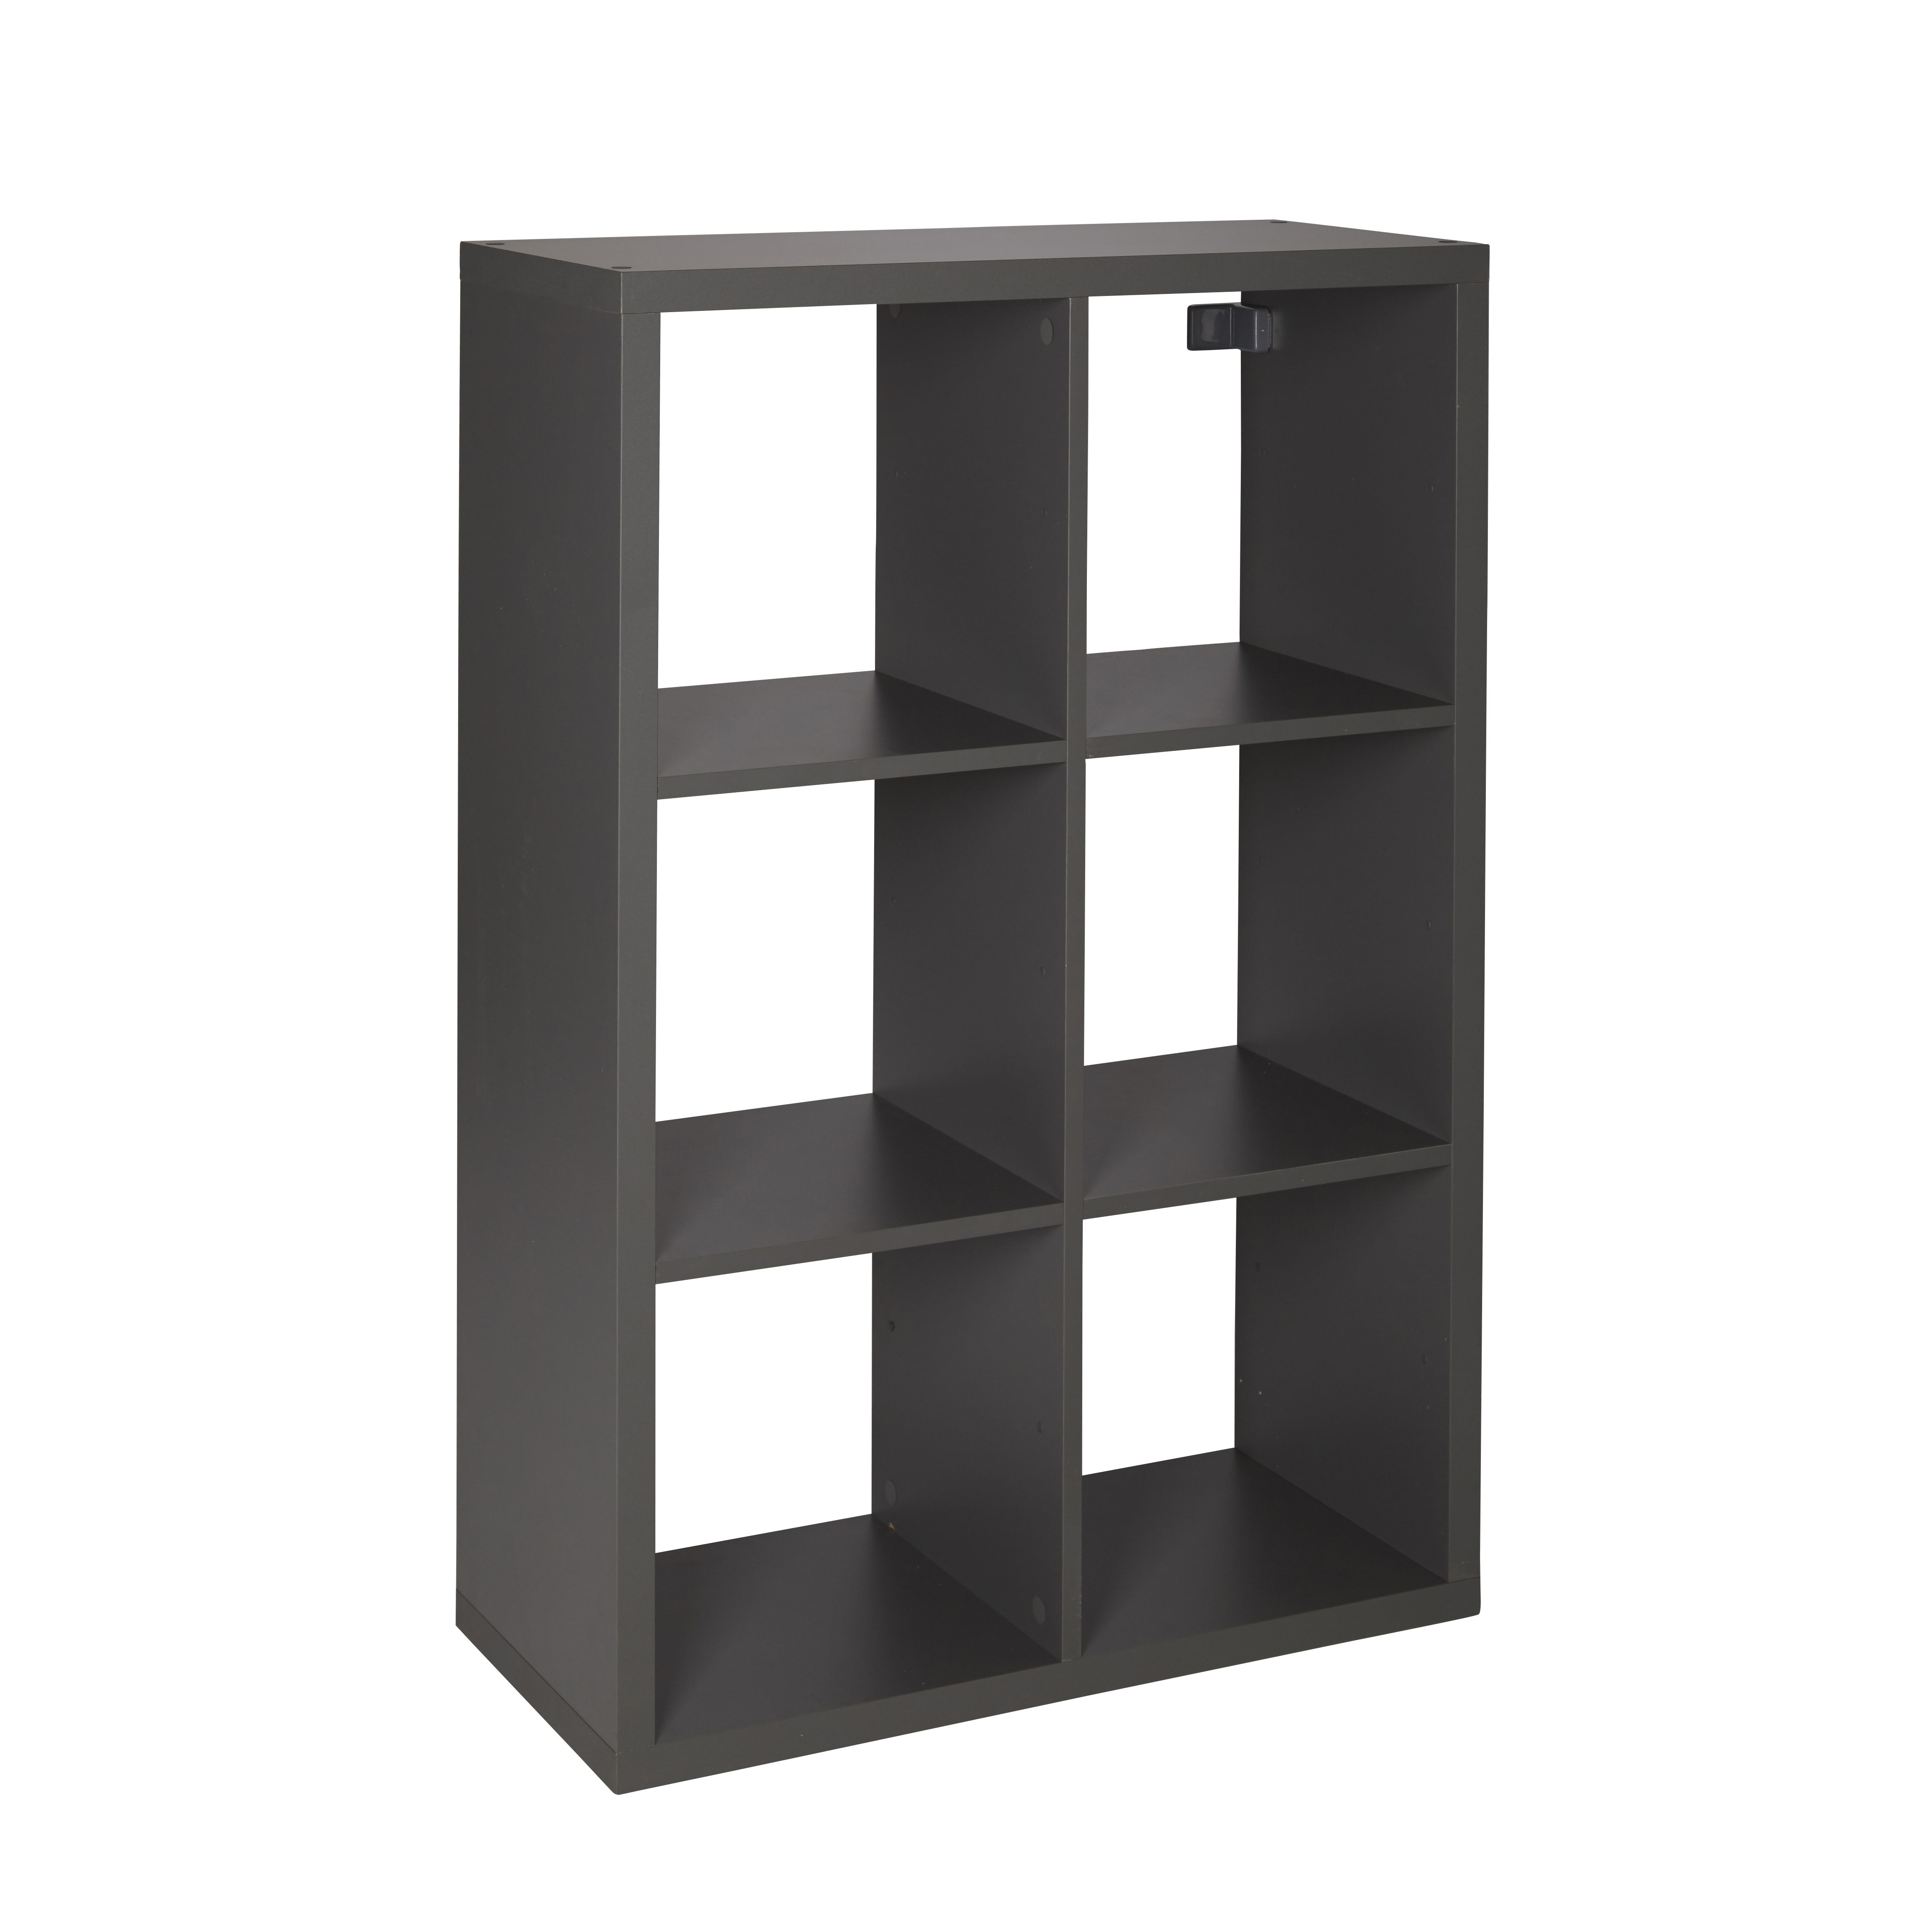 Form Mixxit Grey 6 Cube Shelving Unit (h)1080mm (w)740mm